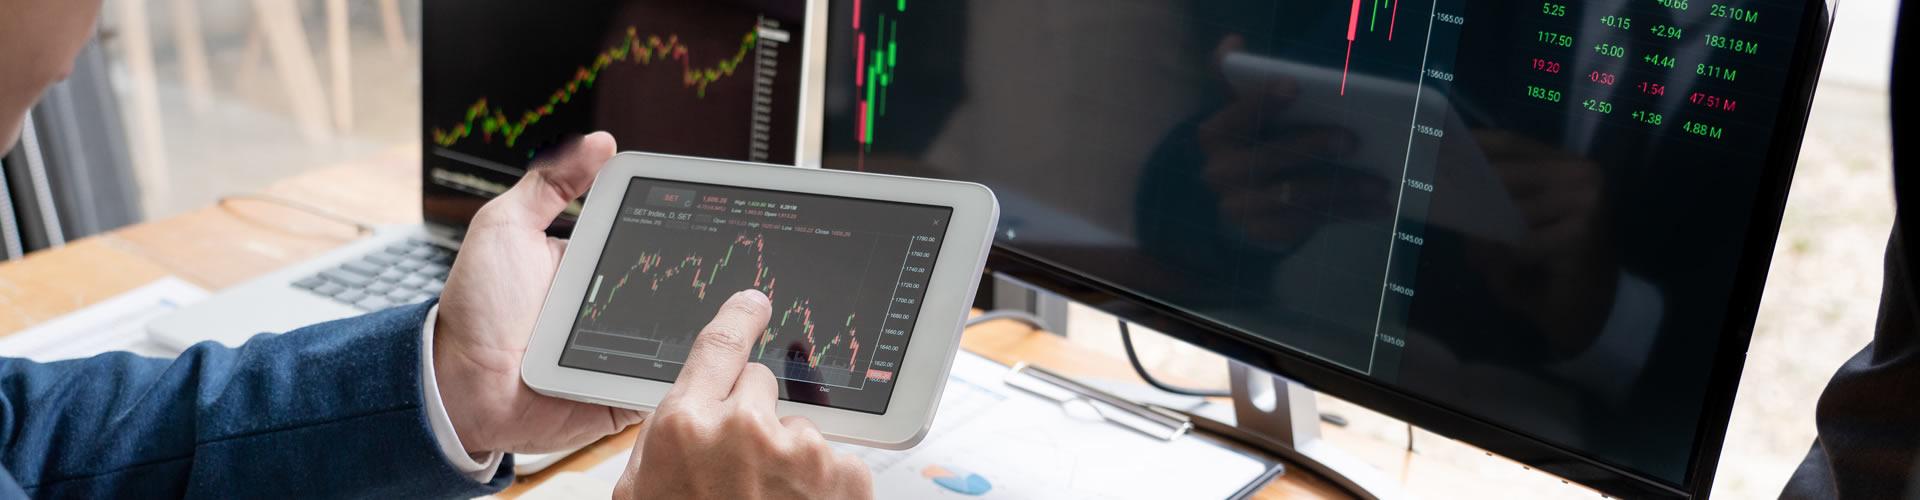 autotrading_api_platform_banner_scandinavian_capital_markets